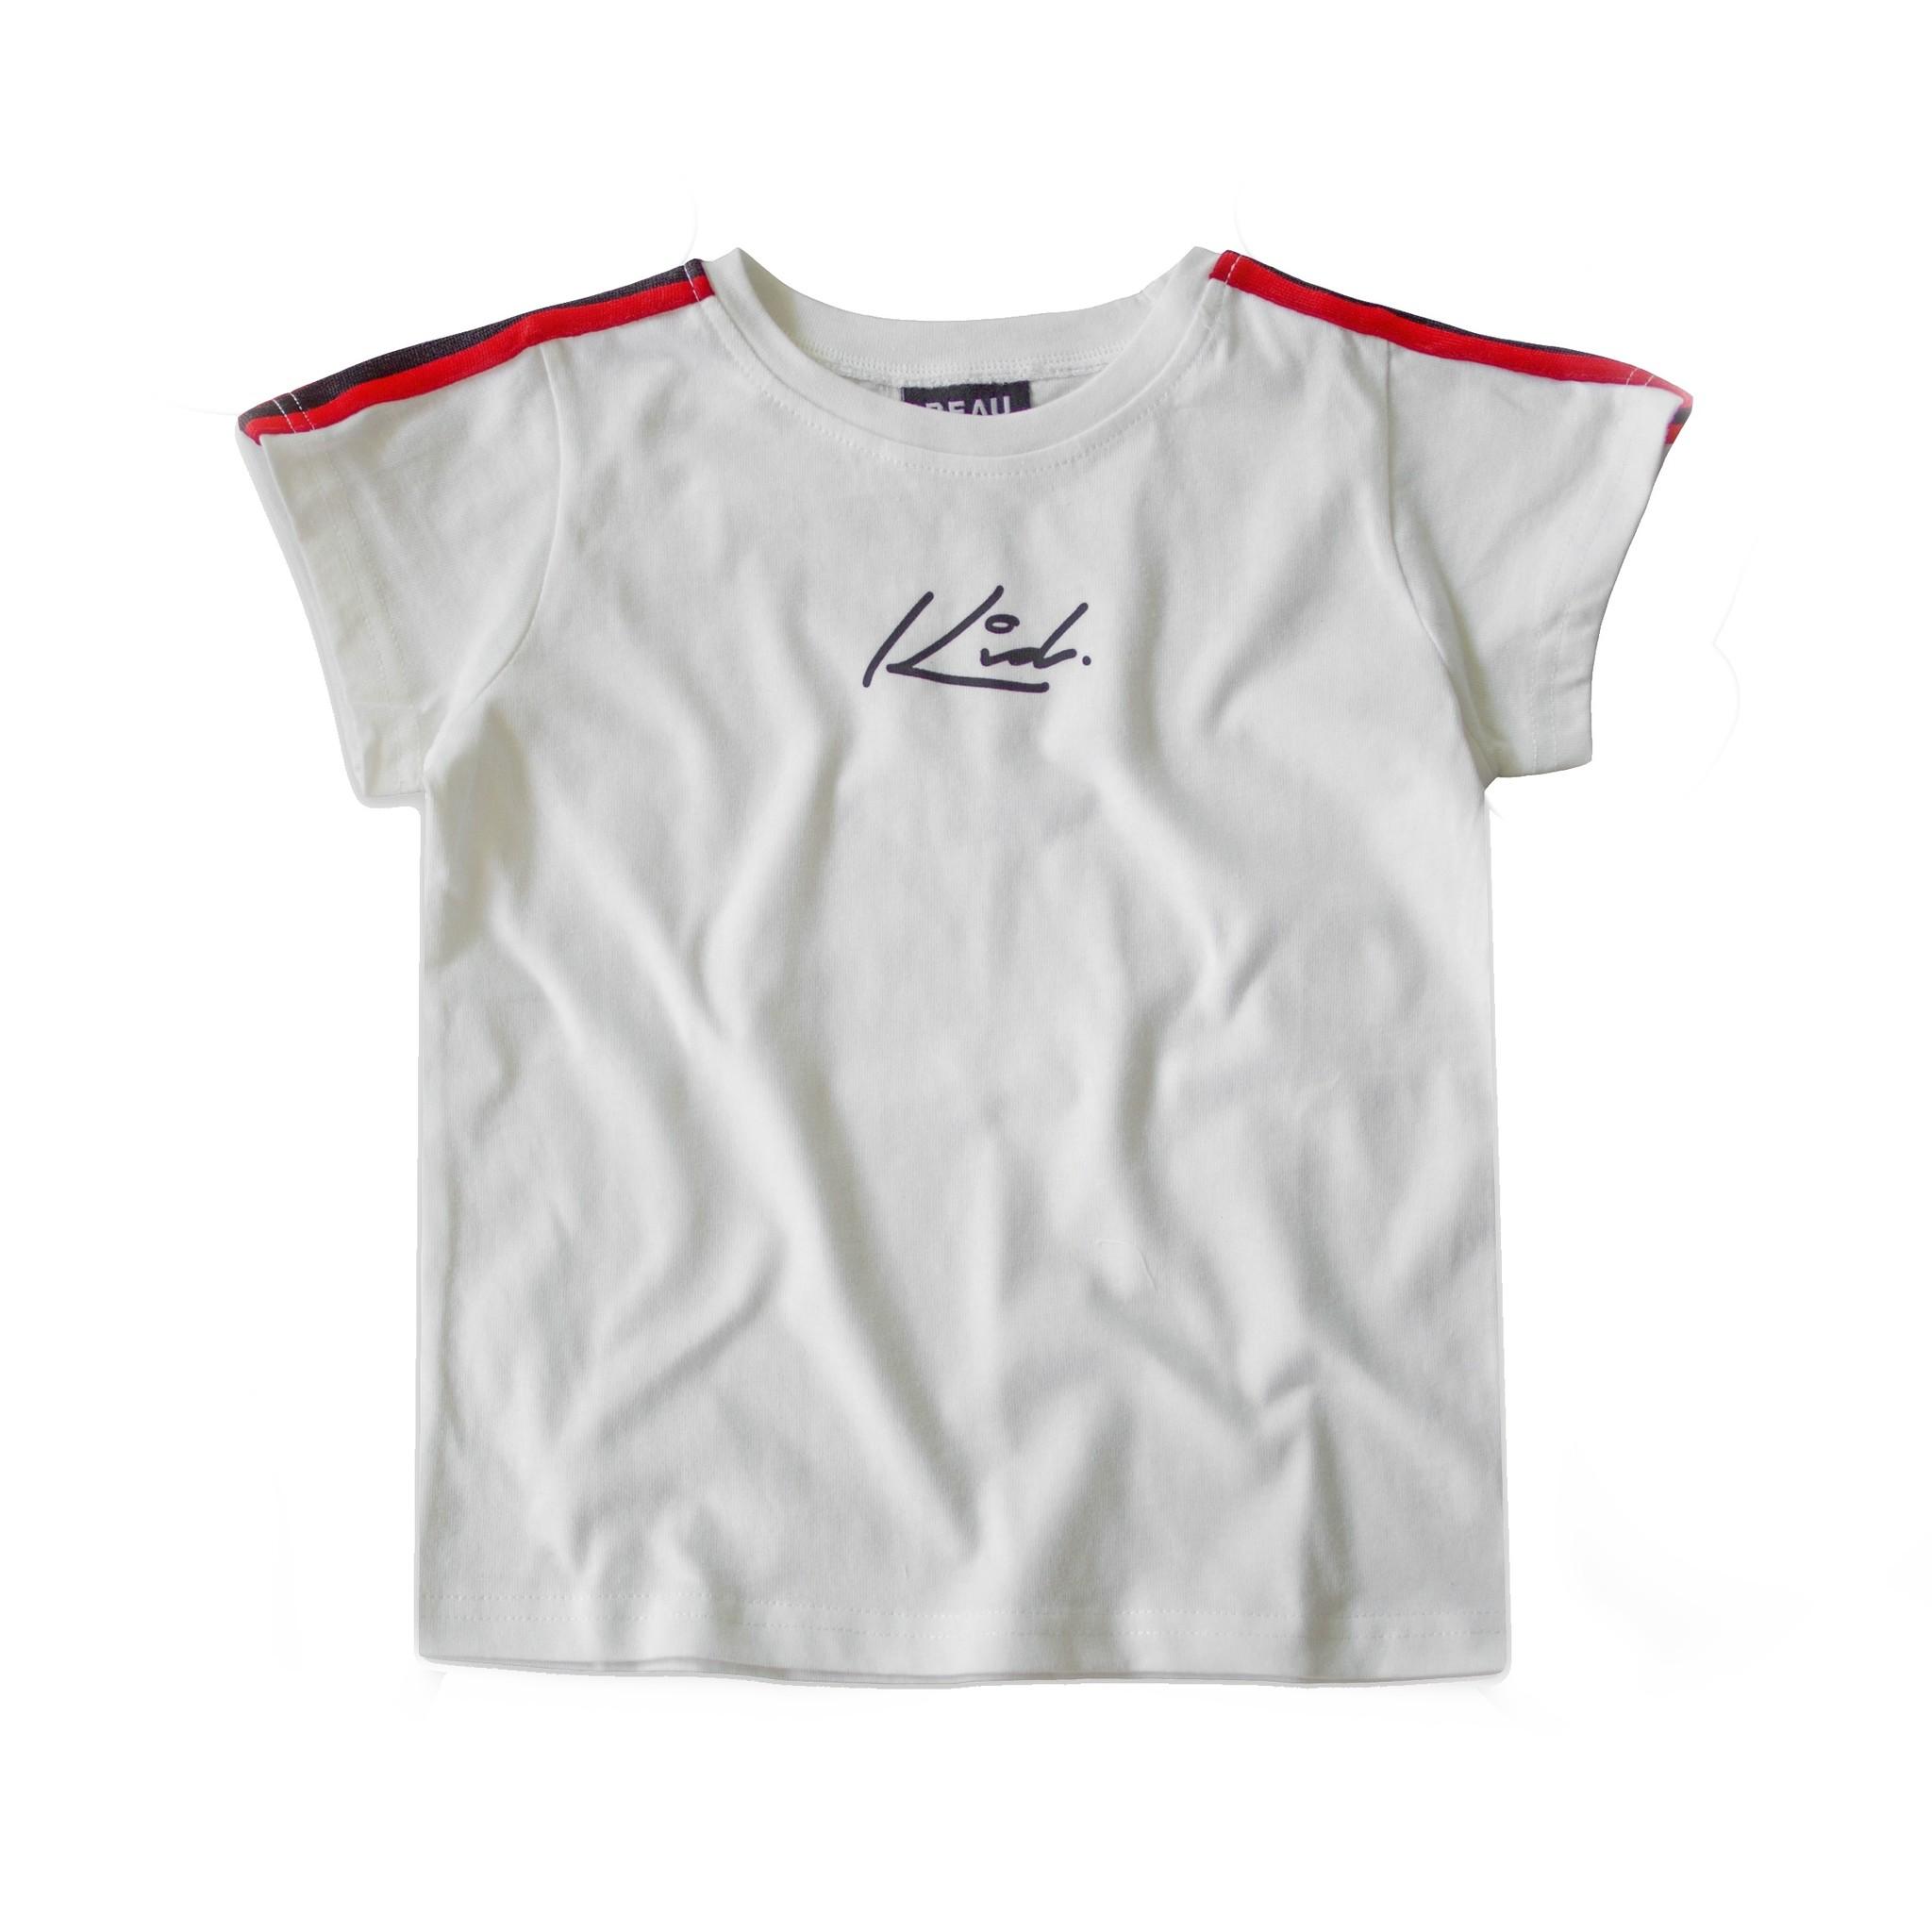 Beaubella Kids WHITE COOL SHIRT| WHITE SHIRT WITH PRINT | BOYS CLOTHING